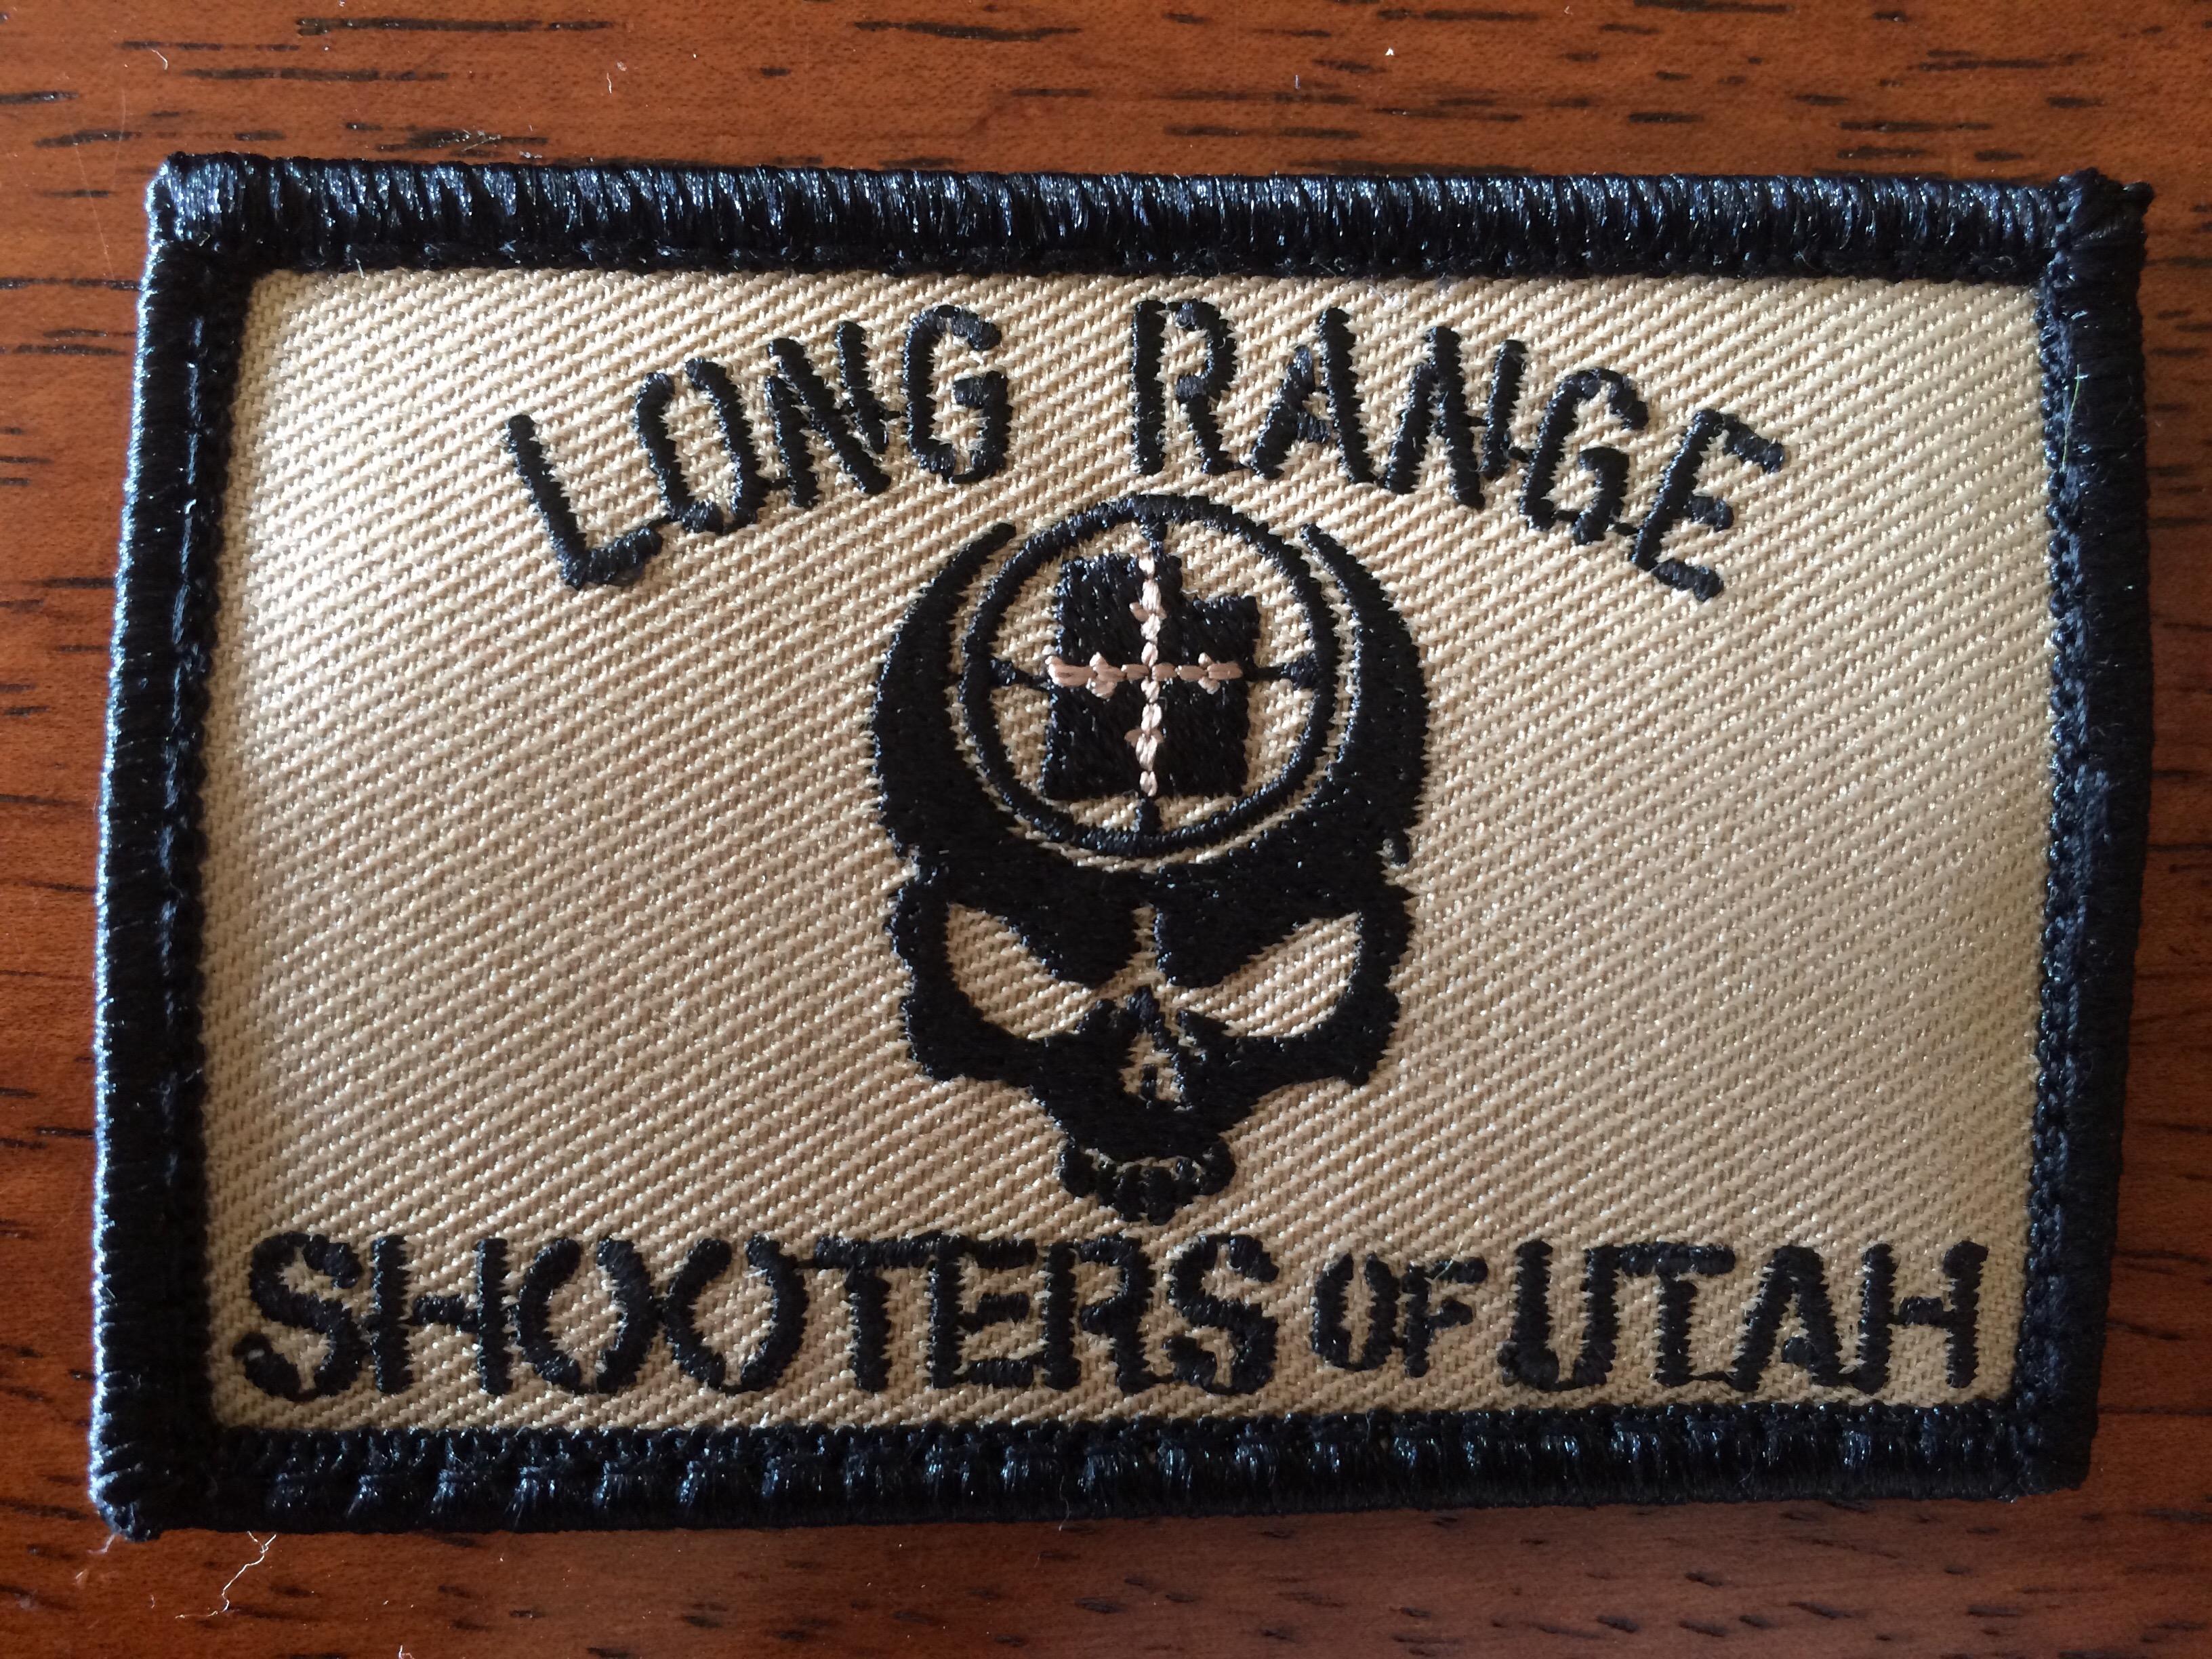 092c3a72ff56a   New for 2015  . Condor Flex Tactical Hats (Flex Fit) with Velcro LRSU  Rifle Logo Patch ...